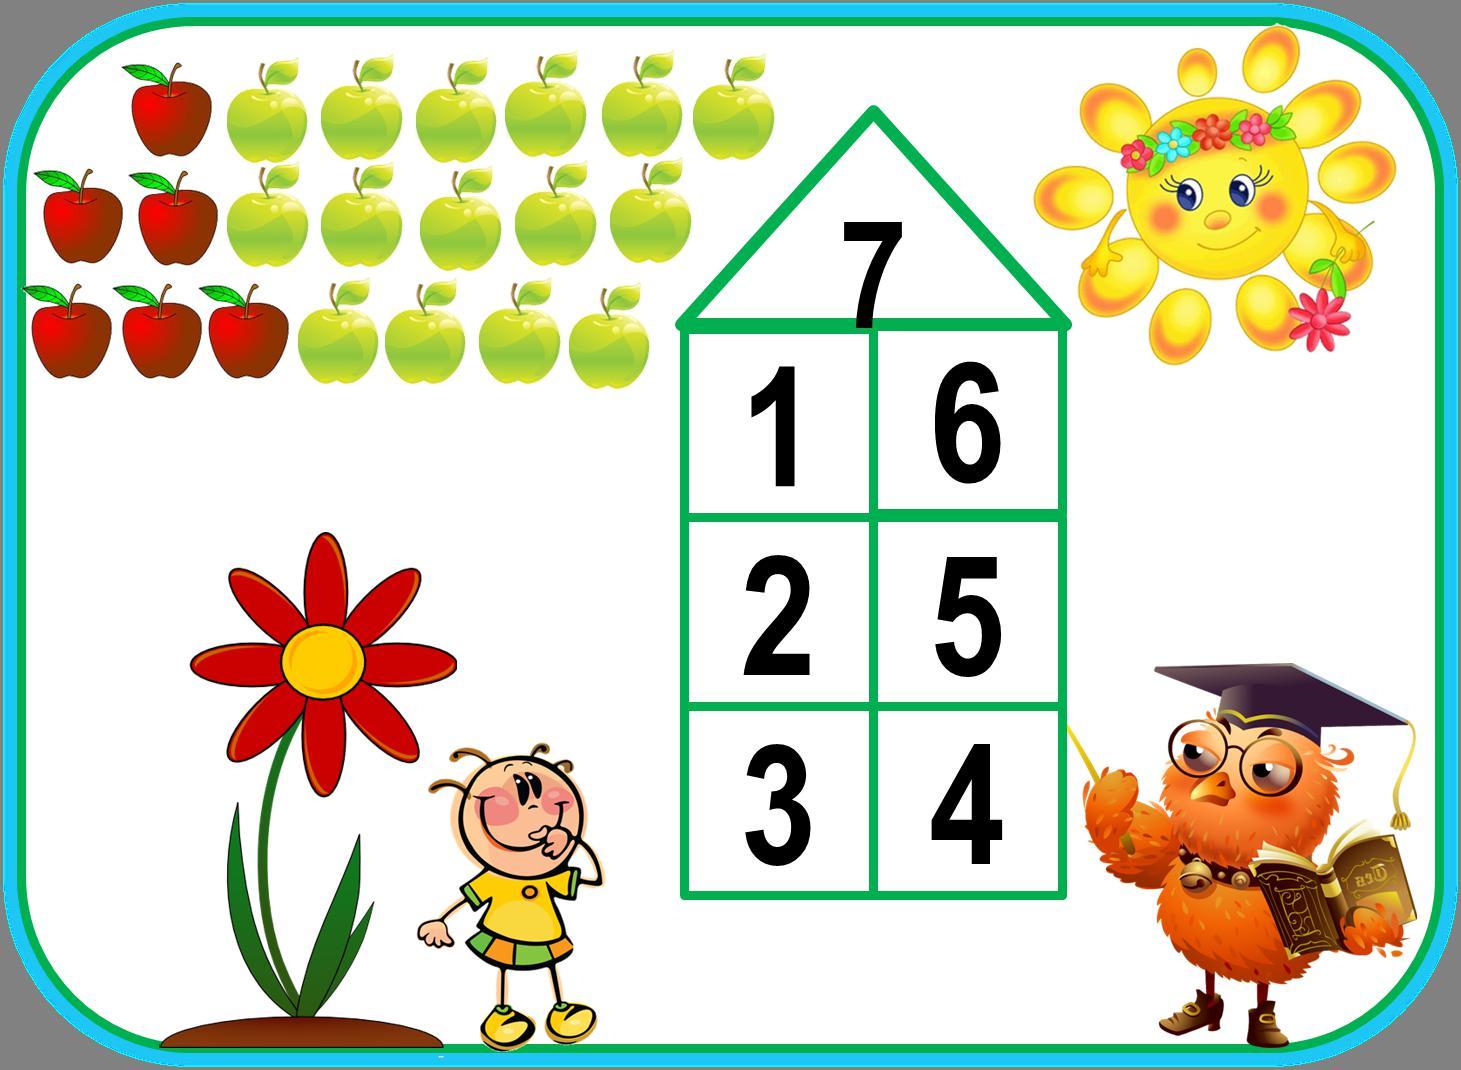 Состав числа Состав числа. Красивые пособия на уроки математики по теме состав числа. Пособия для школьников